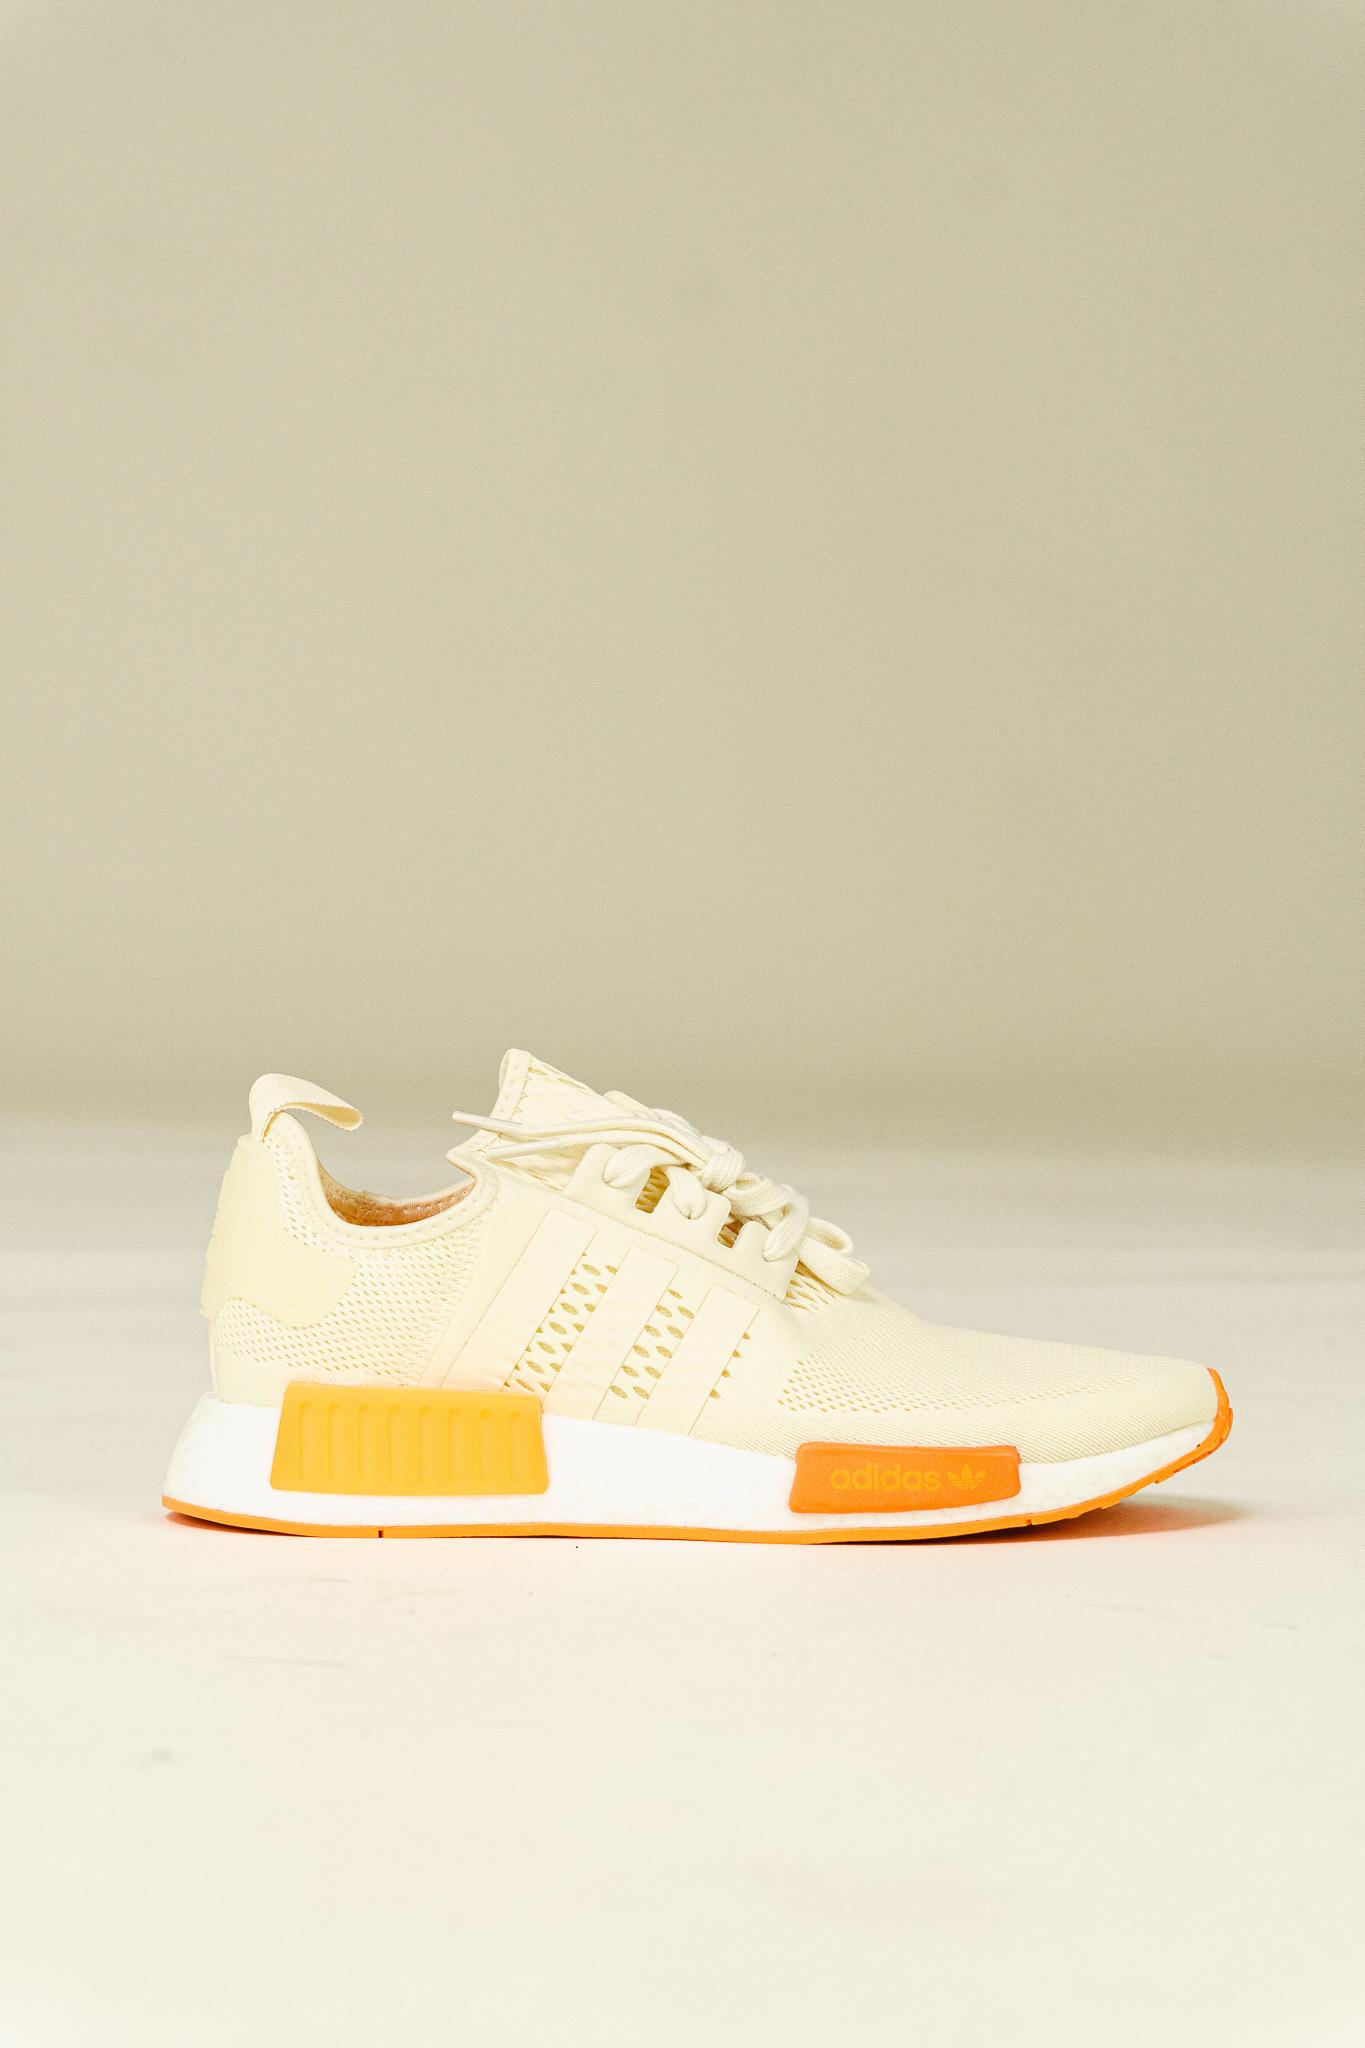 Adidas NMD_R1 'Cream White/Screaming Orange|FY5984|TOP FASHION